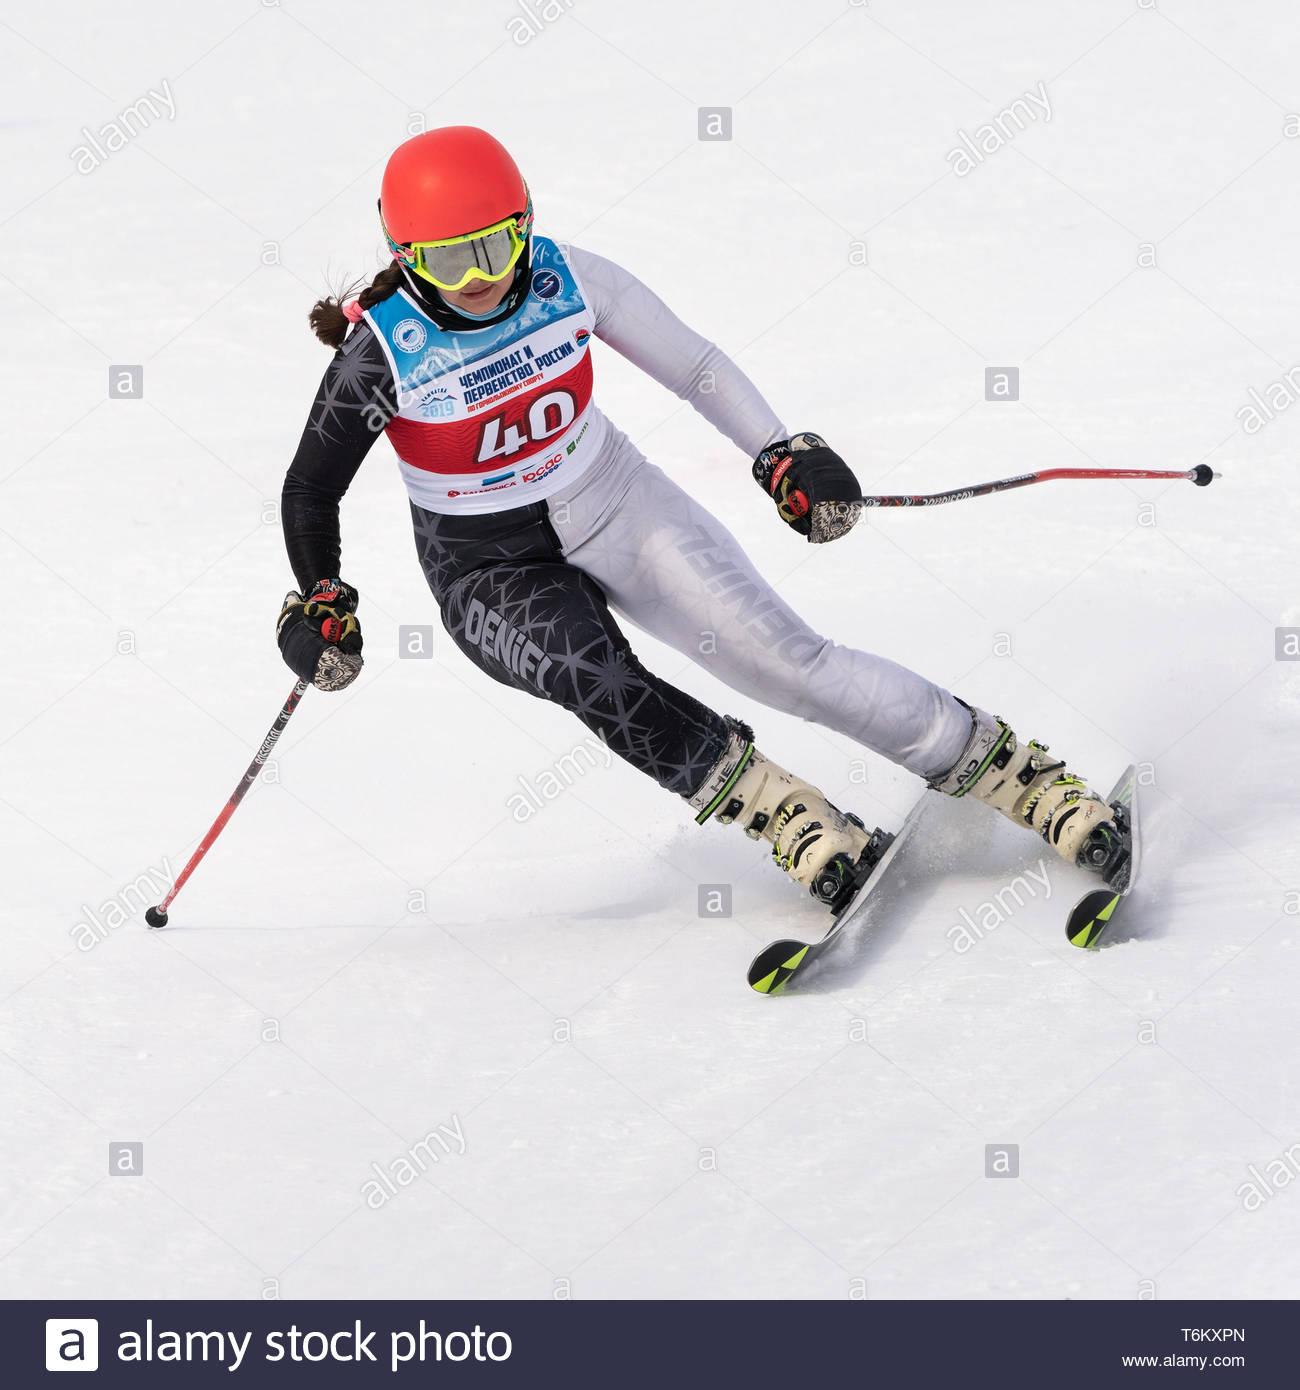 KAMCHATKA, RUSSIA - APRIL 2, 2019: Mountain skier Kudryavtseva Ekaterina (St. Petersburg) skiing down mount. Russian Women's Alpine Skiing Cup, Intern - Stock Image